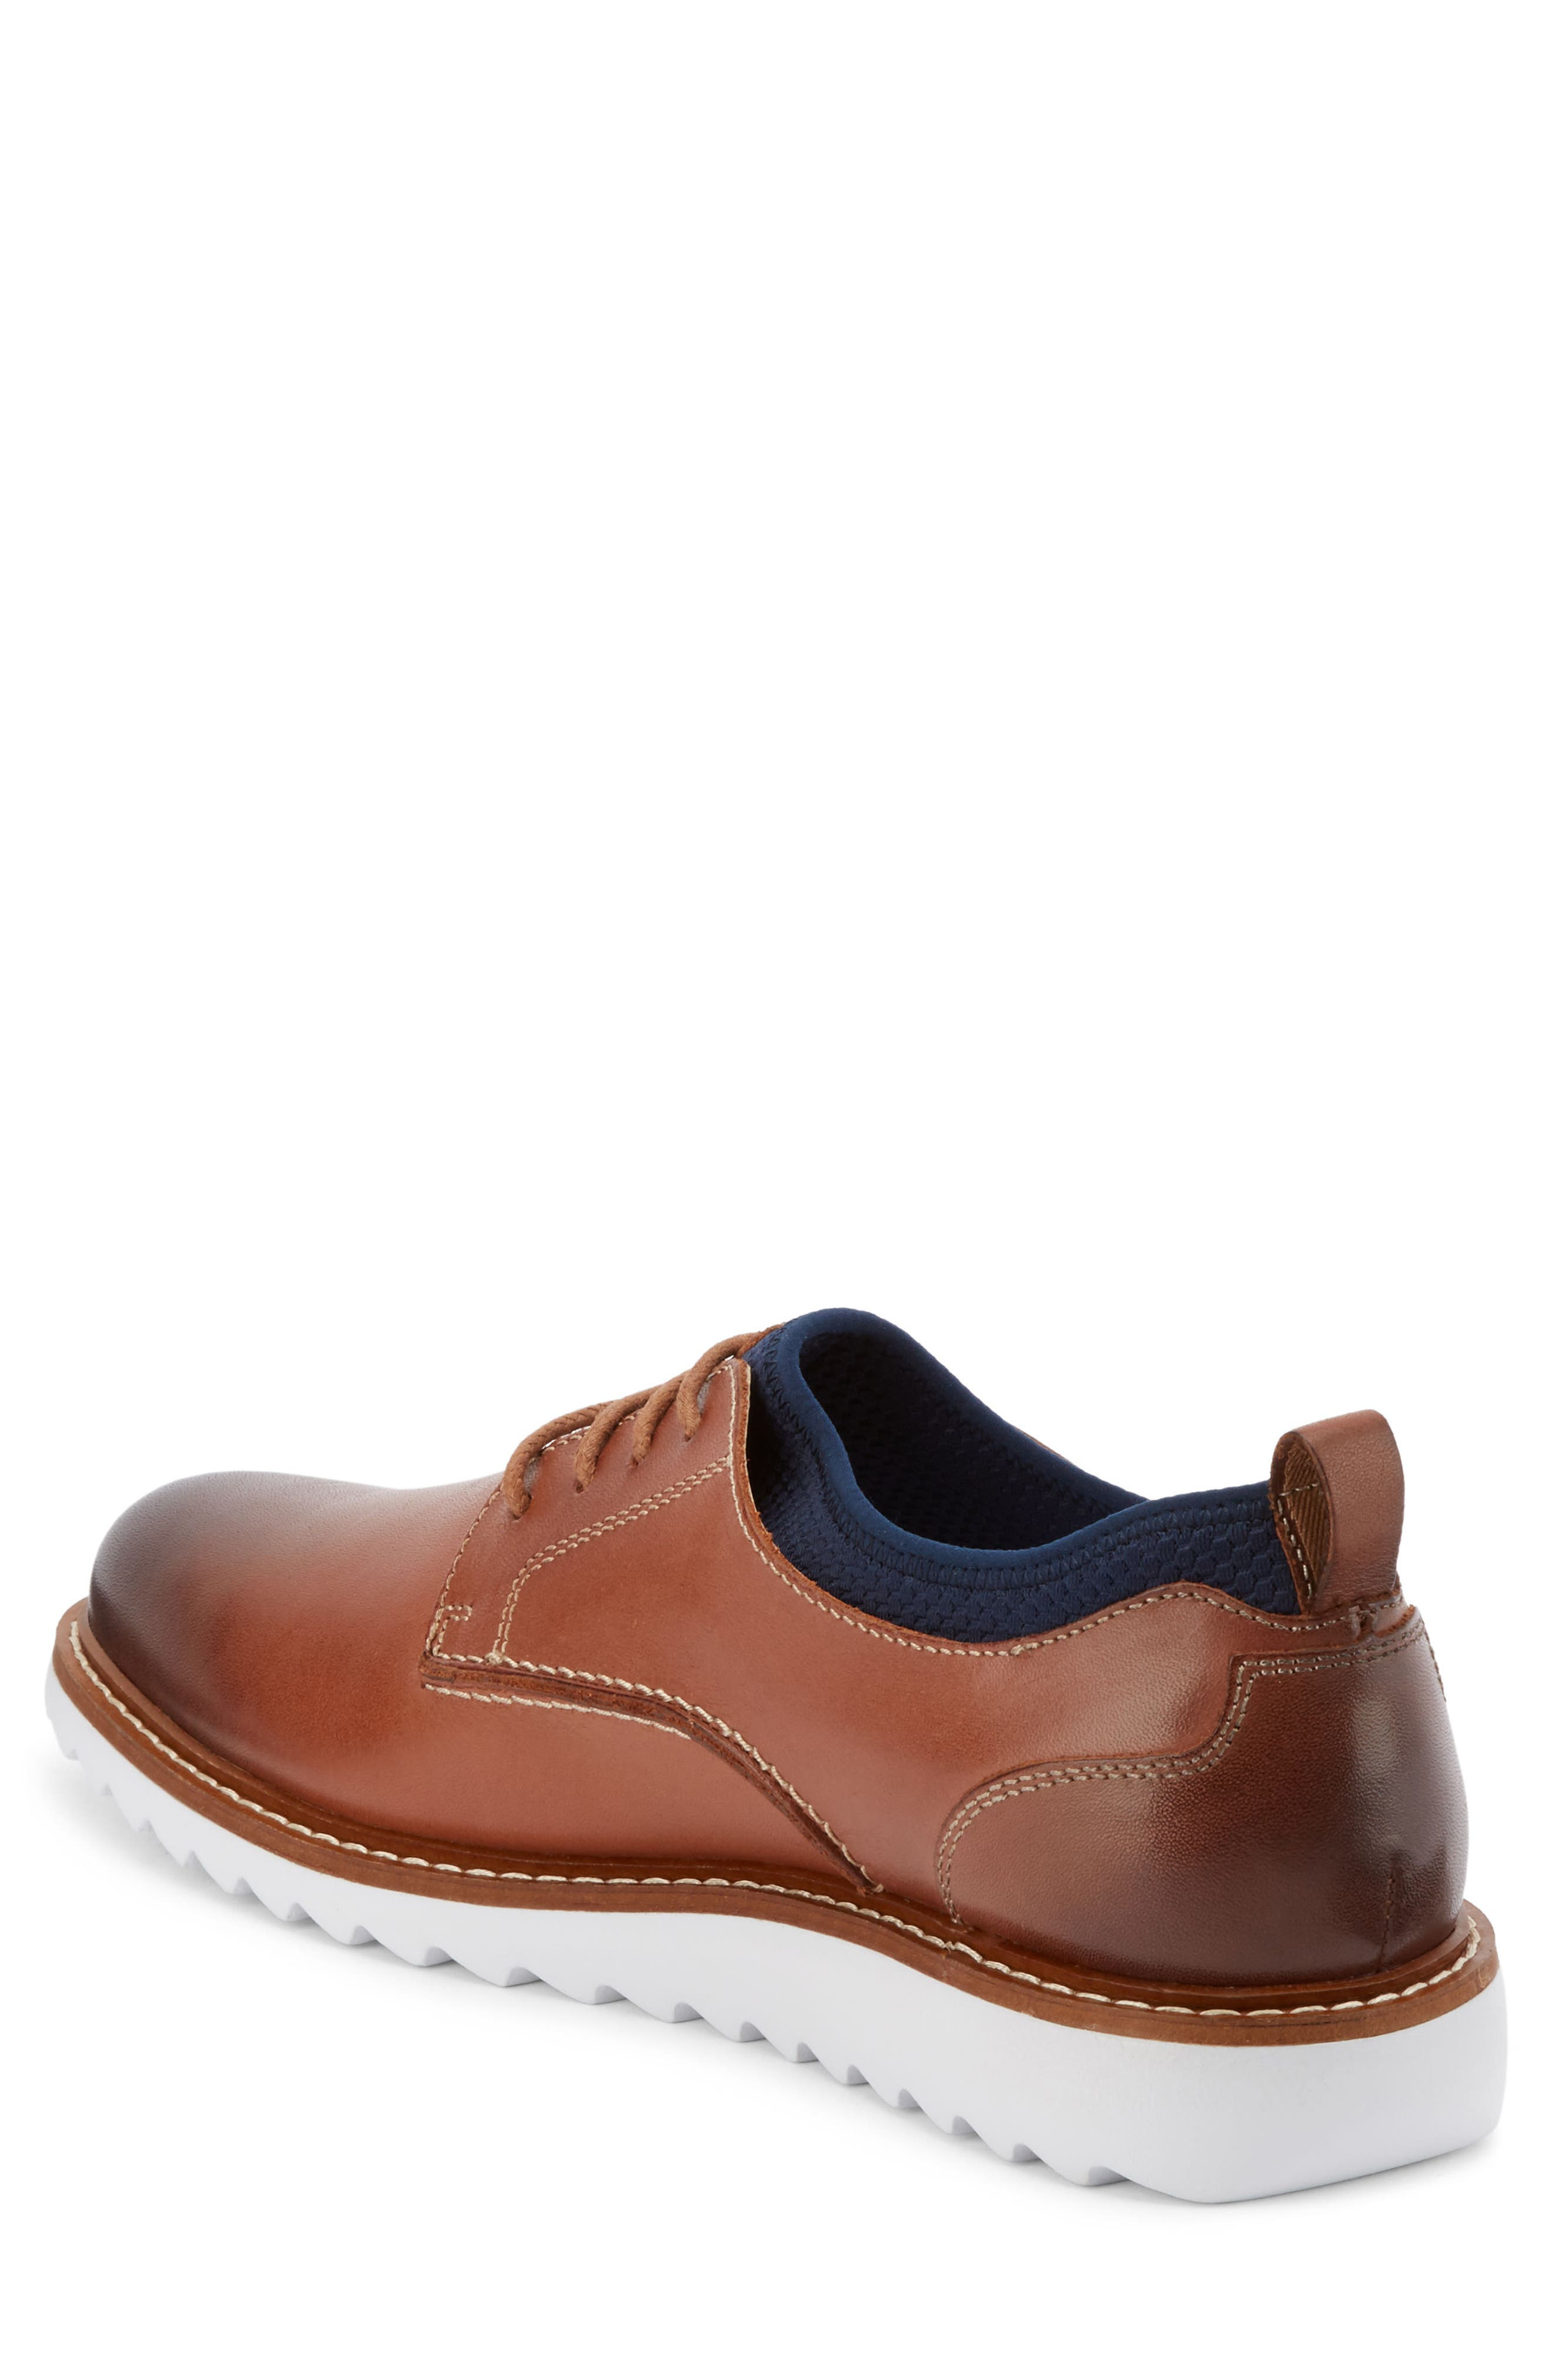 Buck 2.0 Plain Toe Derby,                             Alternate thumbnail 2, color,                             Tan Burnished Leather